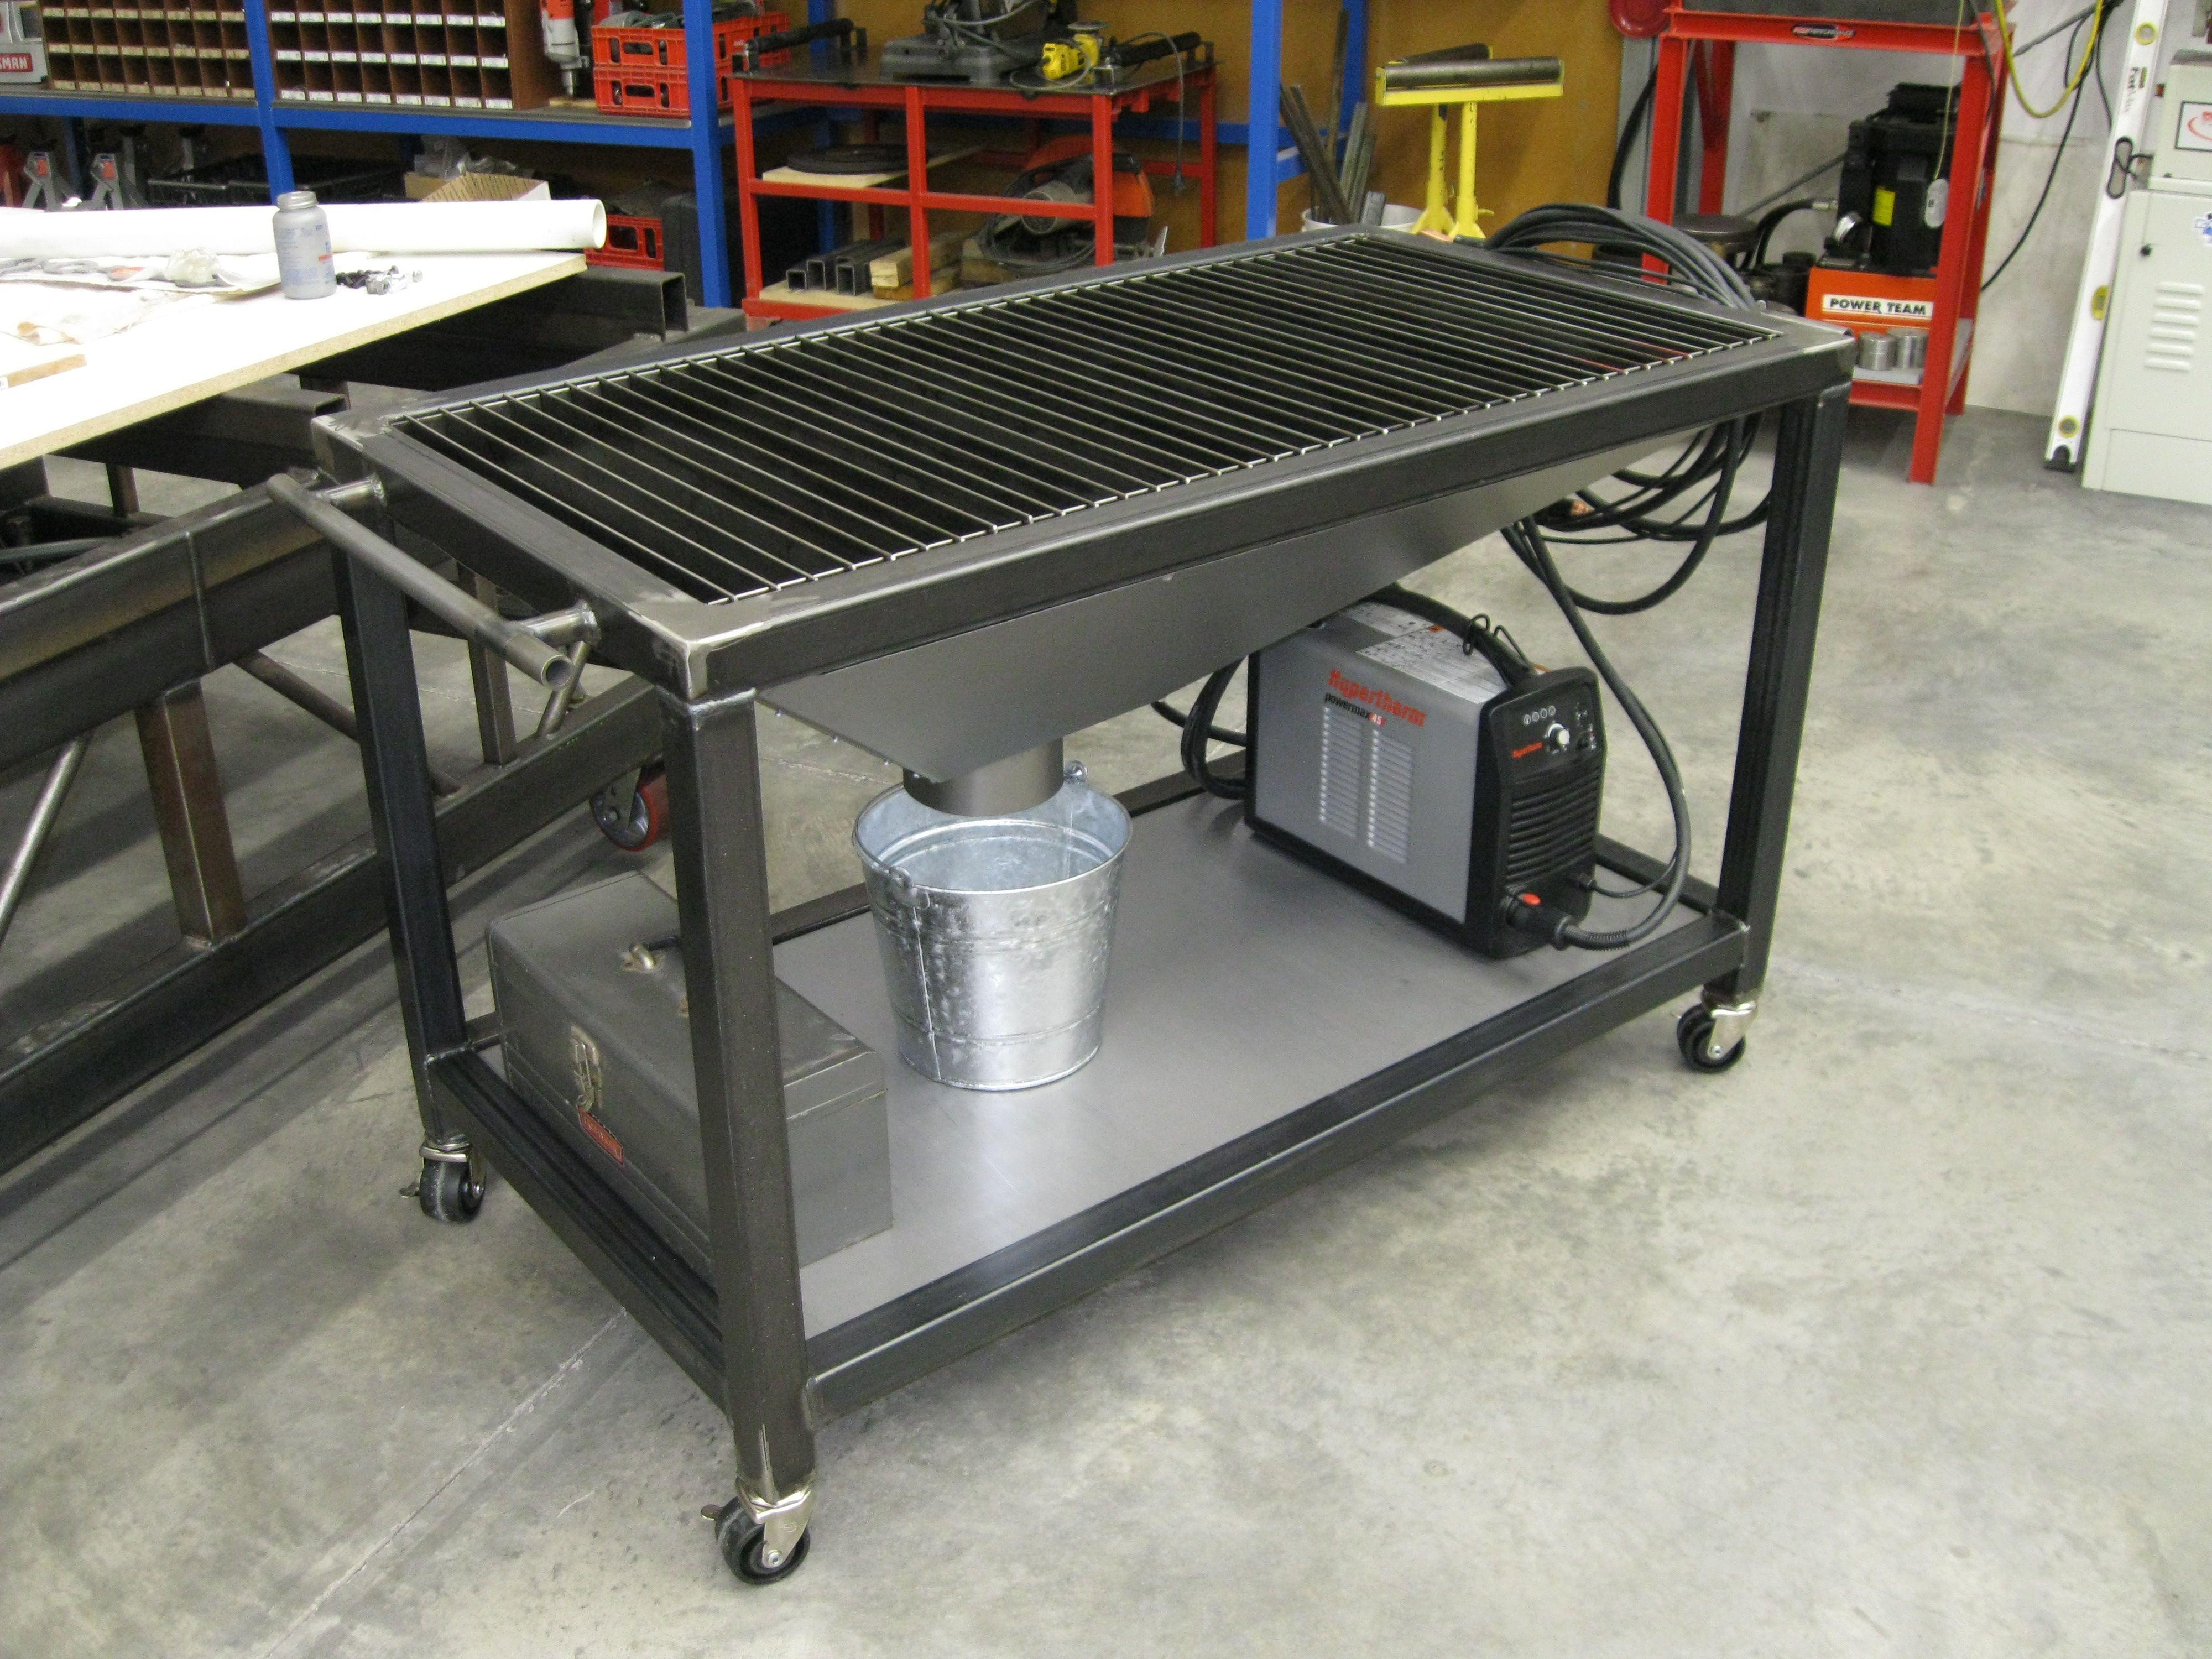 Design elements plasma cutting custom design plasma cutting artistic - Downdraft Table Design Welding Plasma Cutting Table